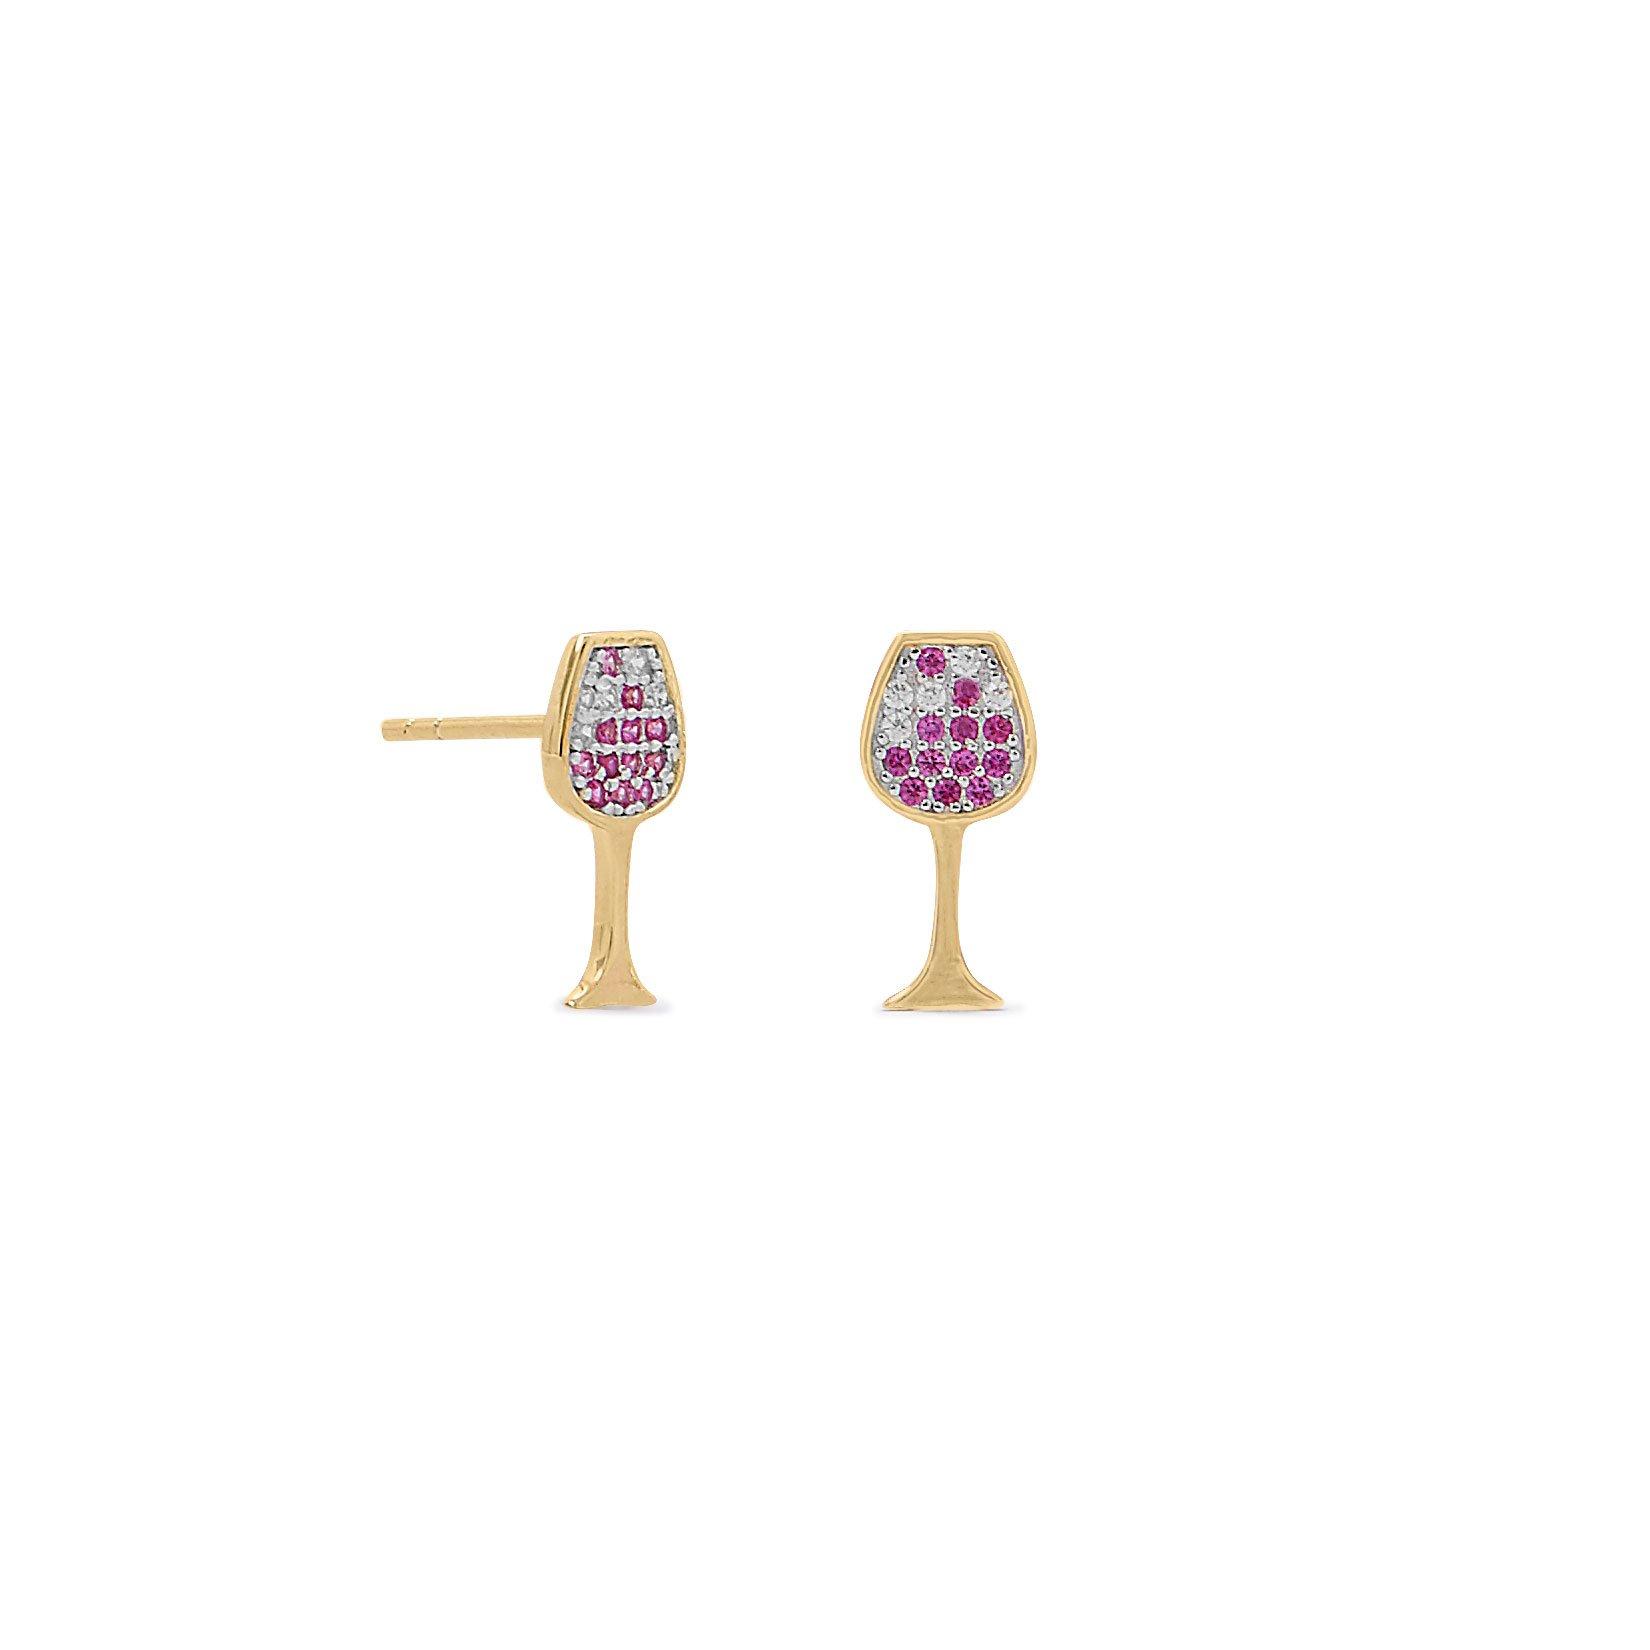 14 Karat Gold Plated CZ Red Wine Glass Stud Earrings